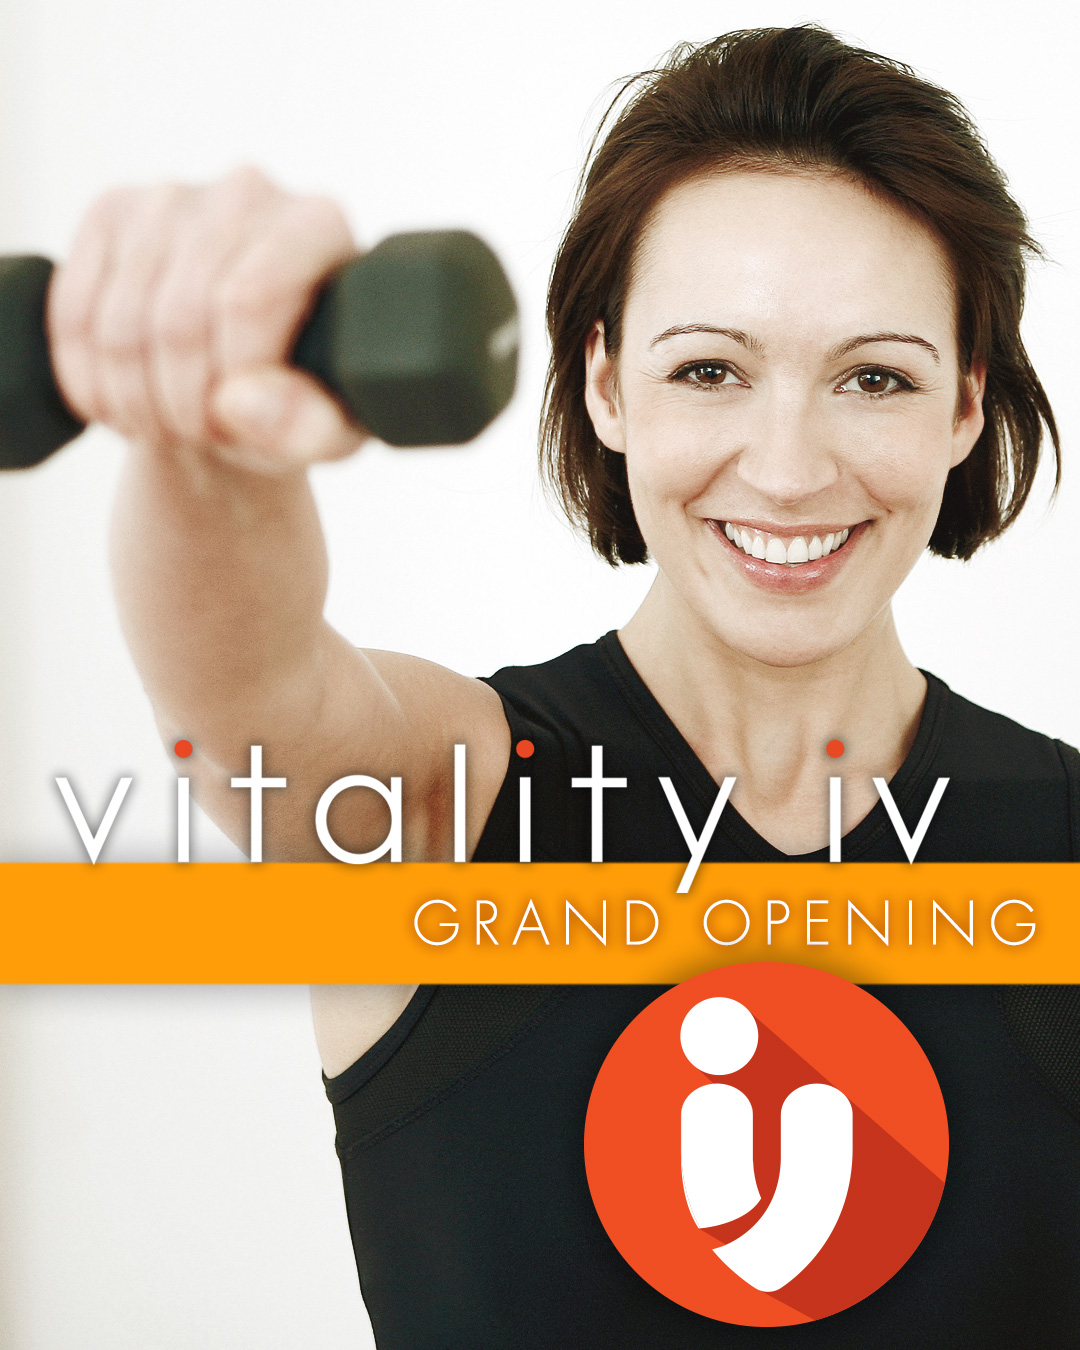 Vitality_IV_Grand_Opening-5.jpg